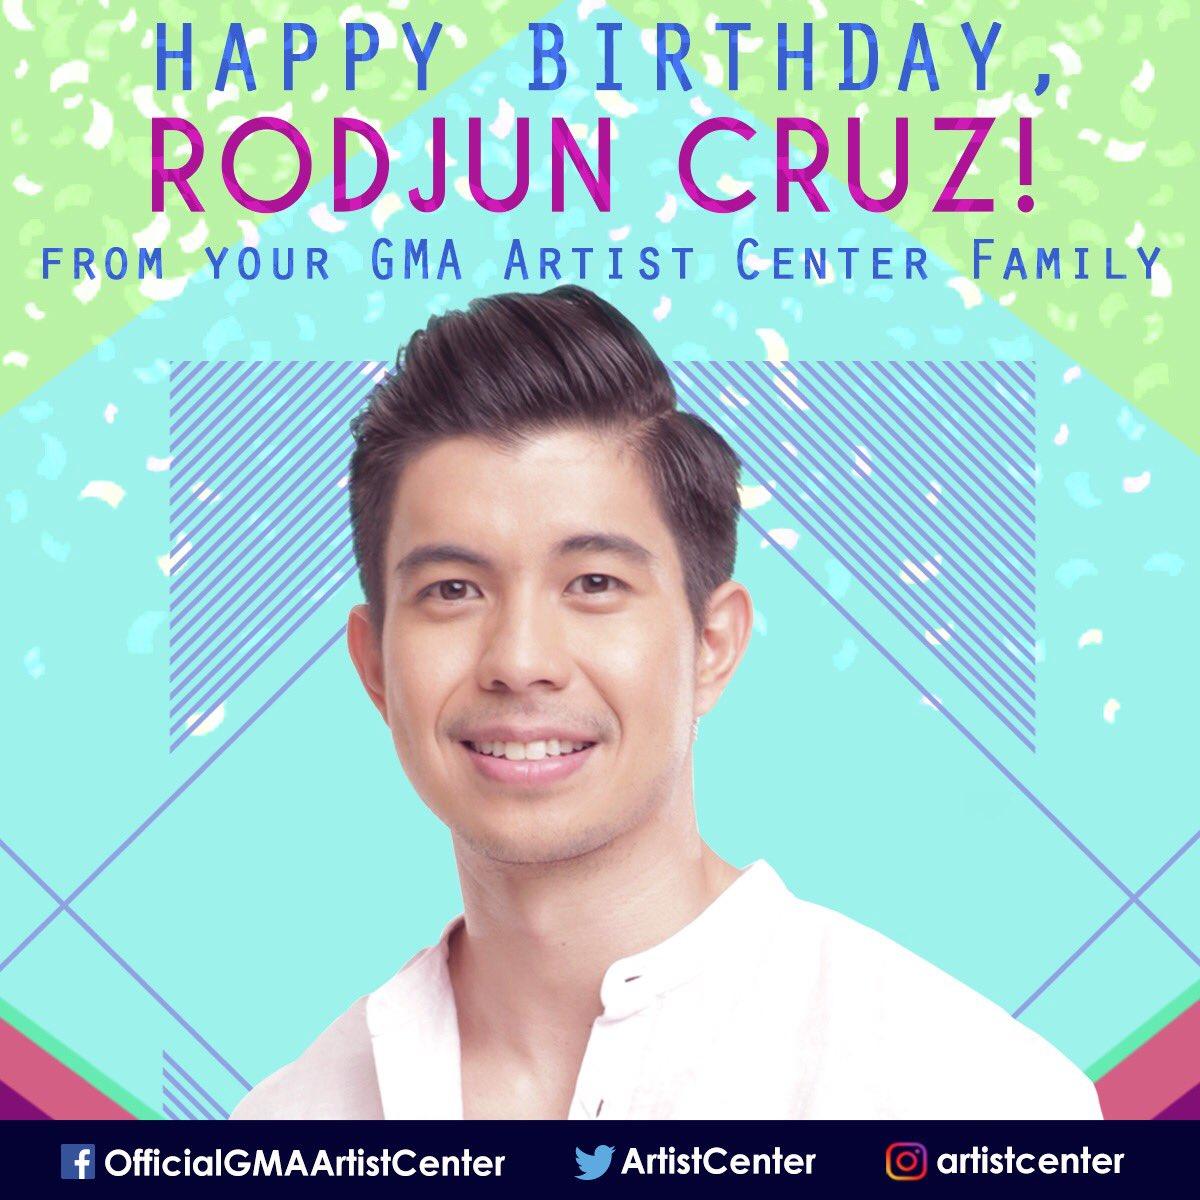 Happy Birthday, Rodjun Cruz! We hope all your birthday wishes come true!